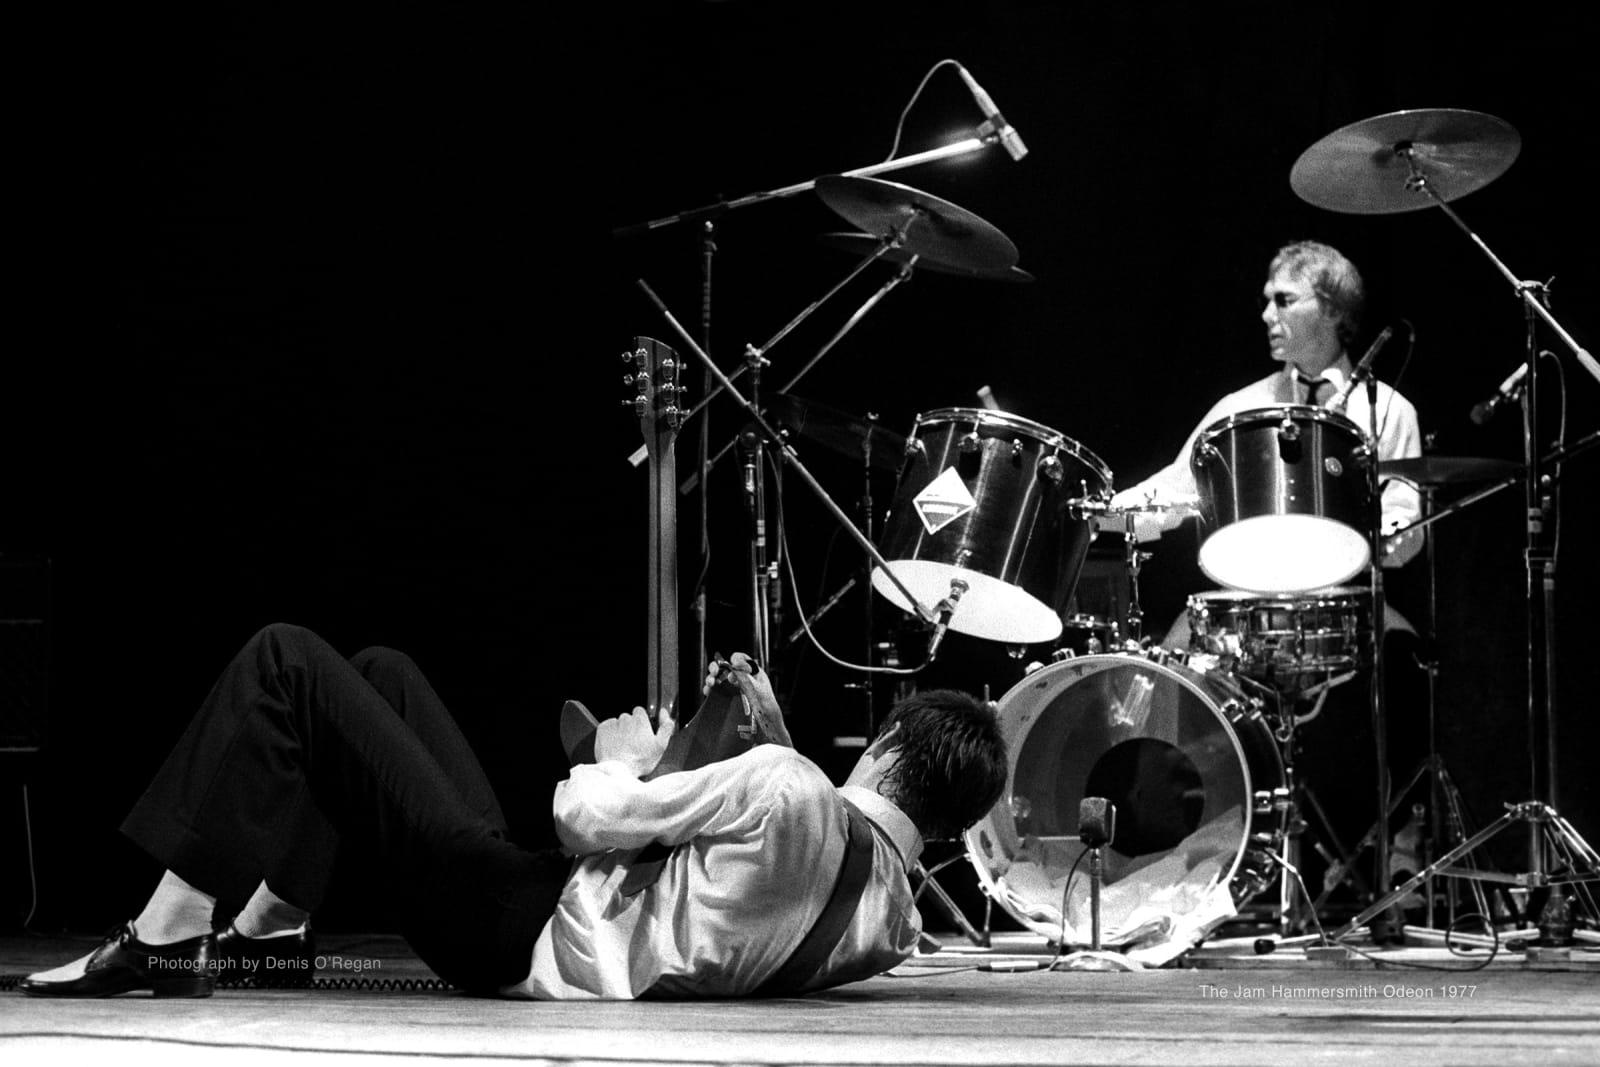 THE JAM, The Jam Hammersmith, 1977